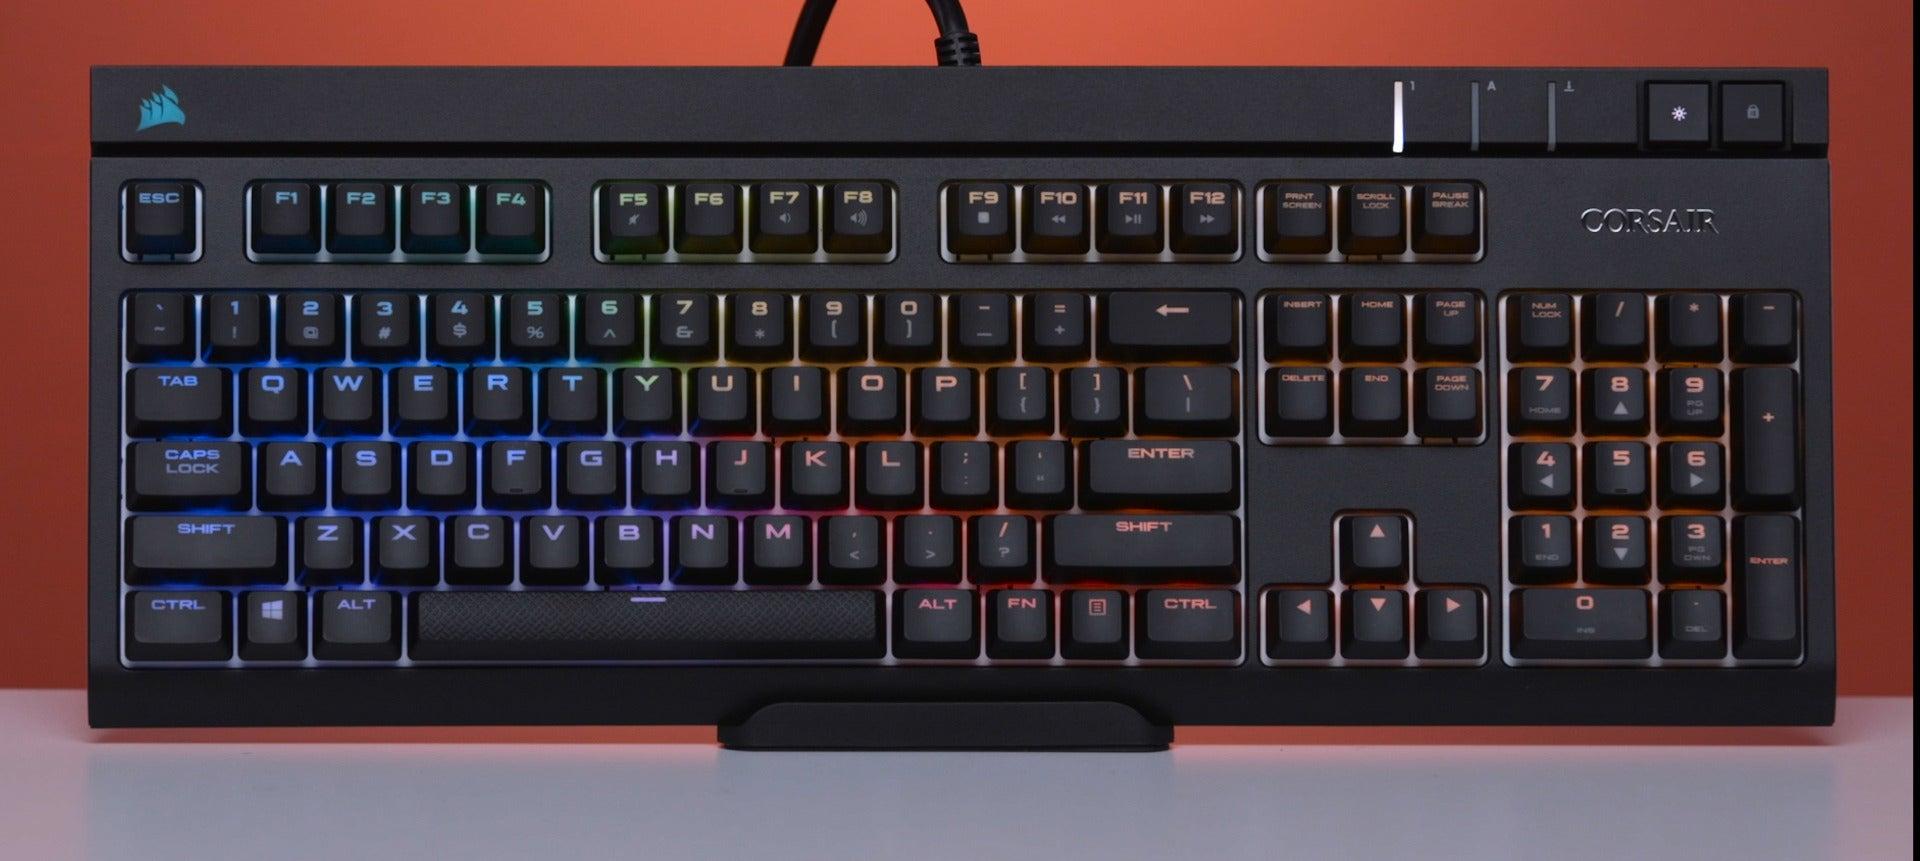 9 killer gifts for PC gamers | PCWorld